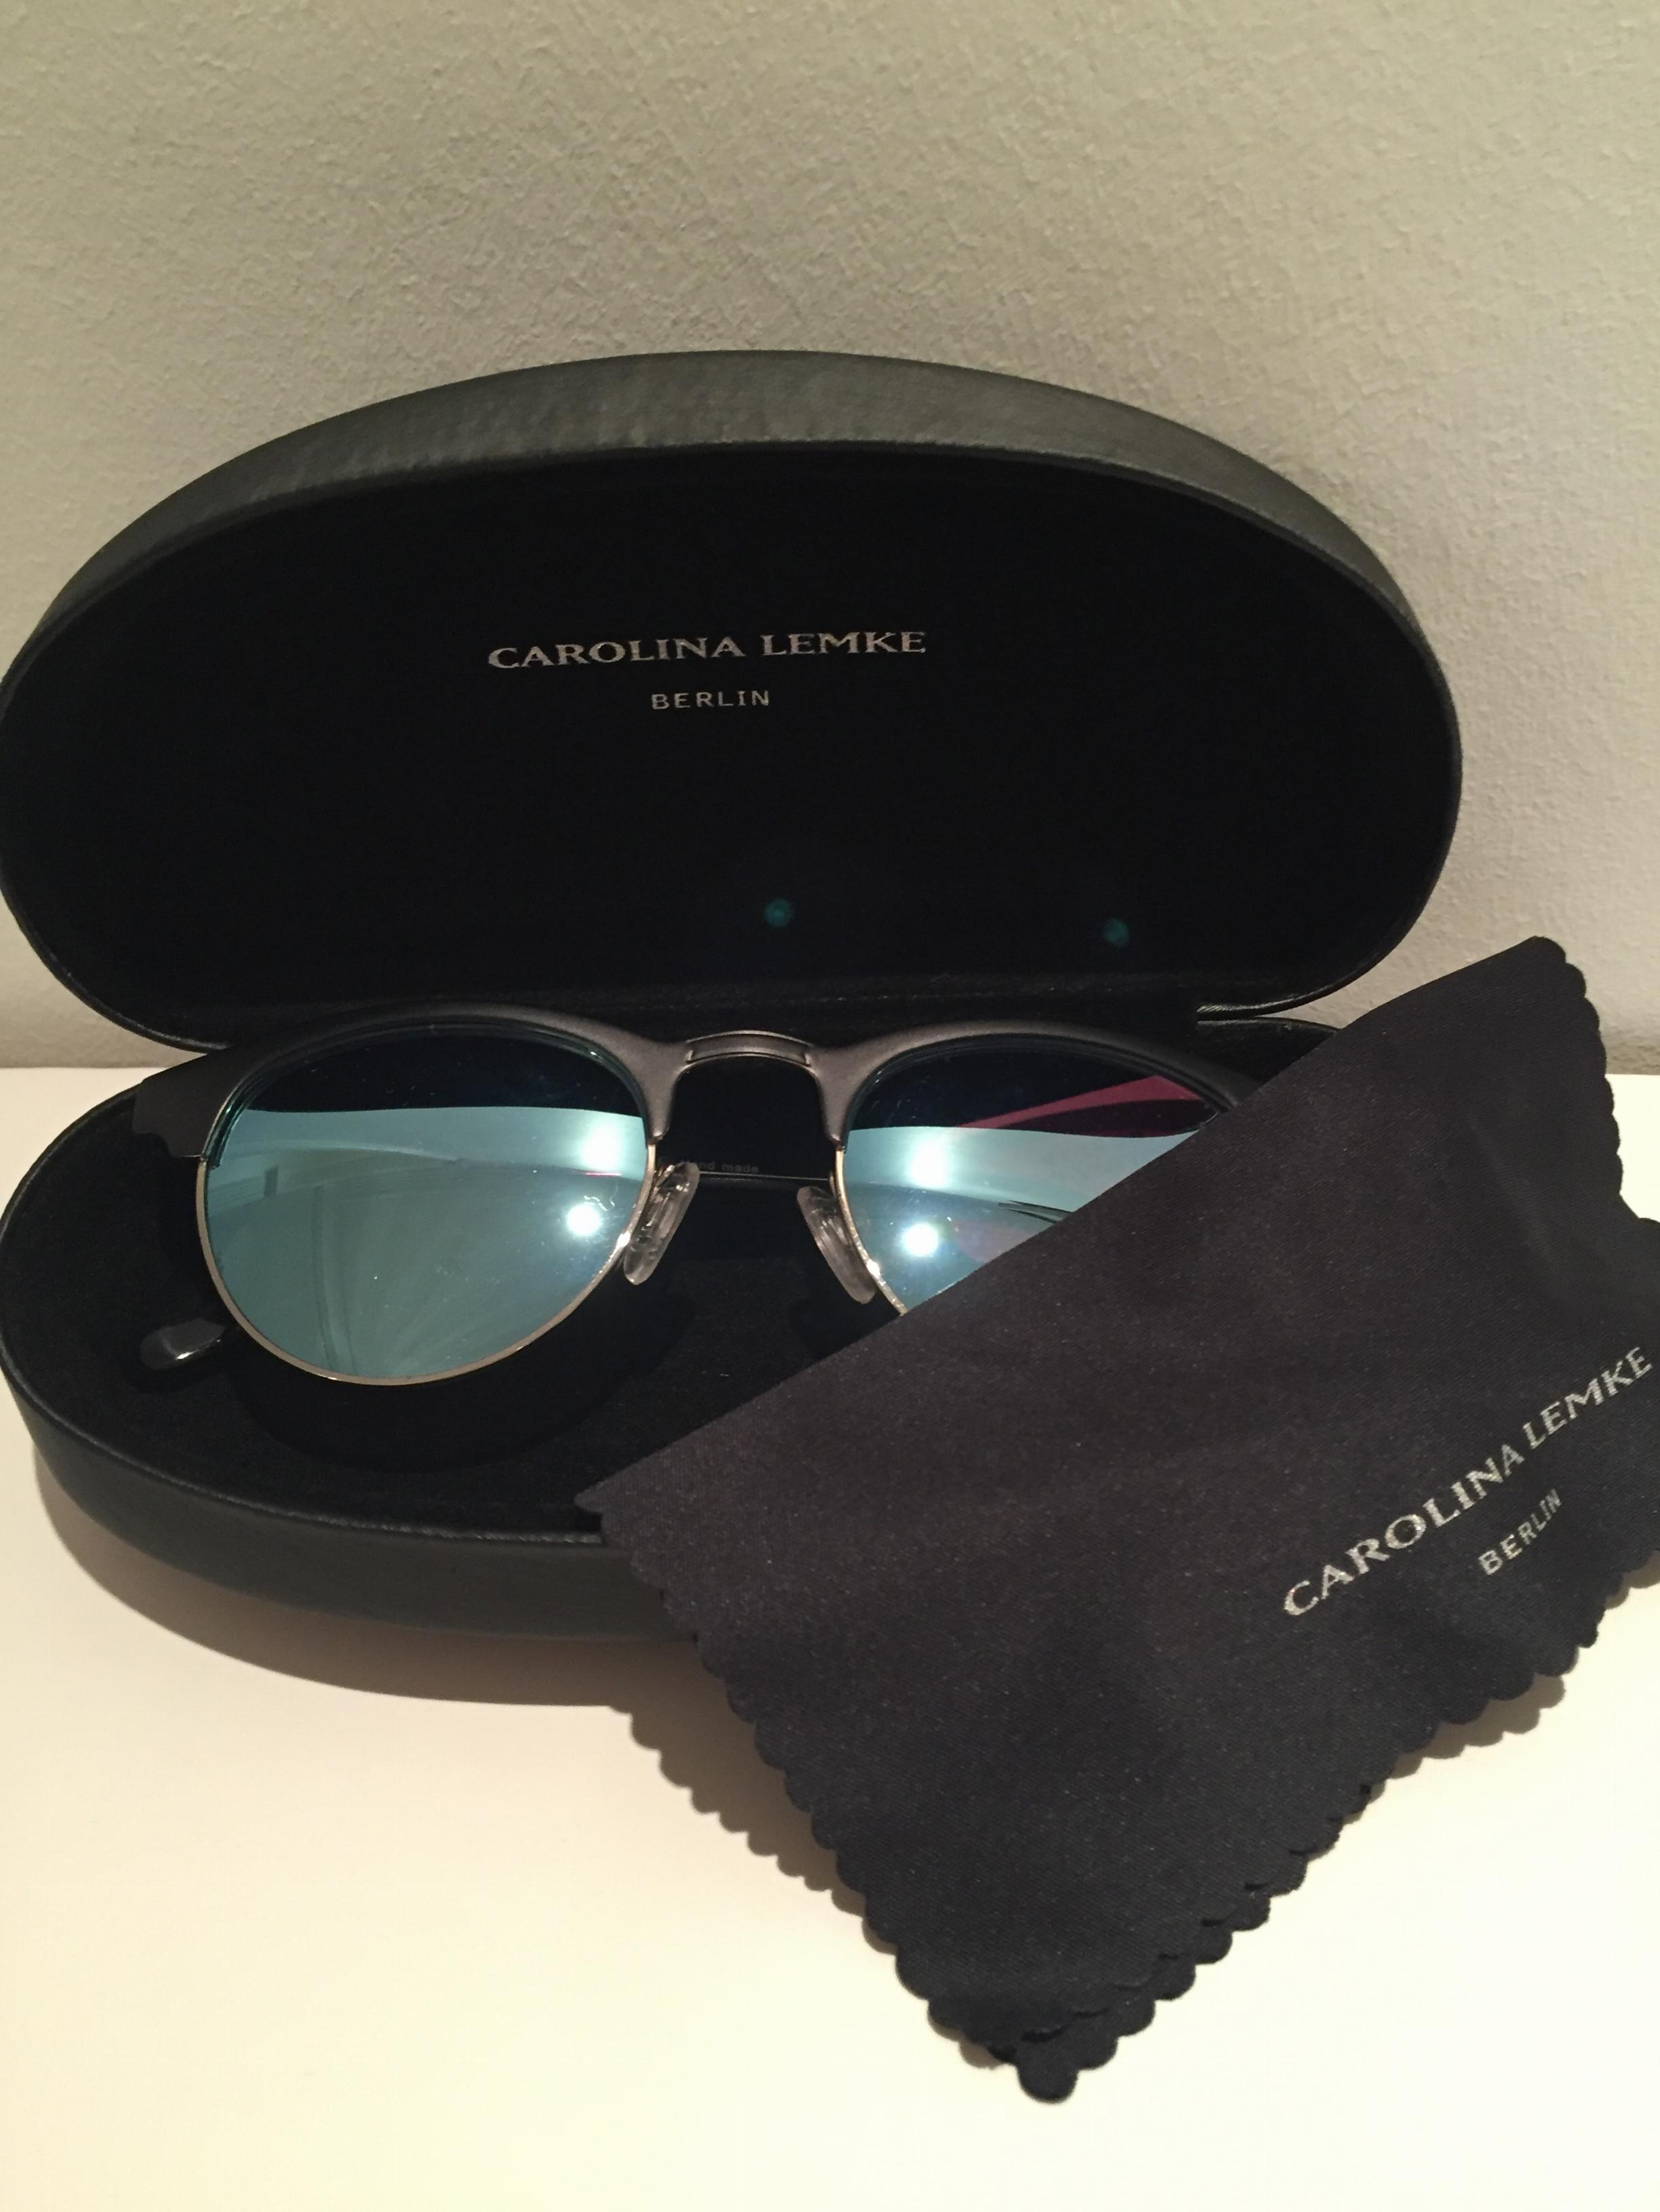 7f0e57324e5 Carolina Lemke Berlin Sunglasses. 25. 12345678910